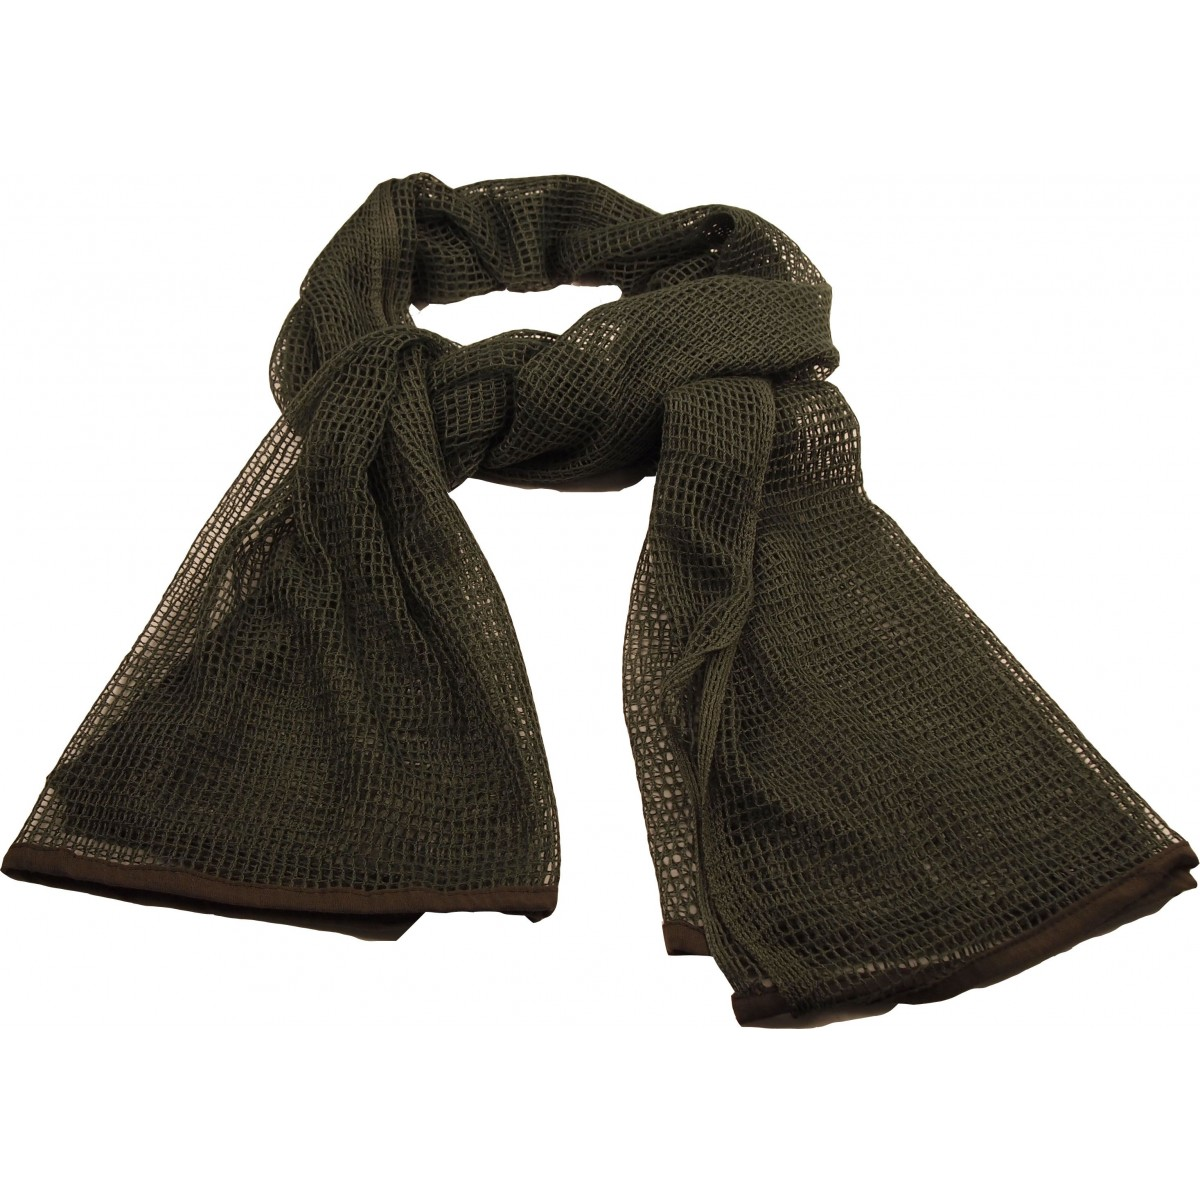 Filet écharpe kaki - Militaire Cheches   Echarpes - securite-defense.fr 48909fa214c